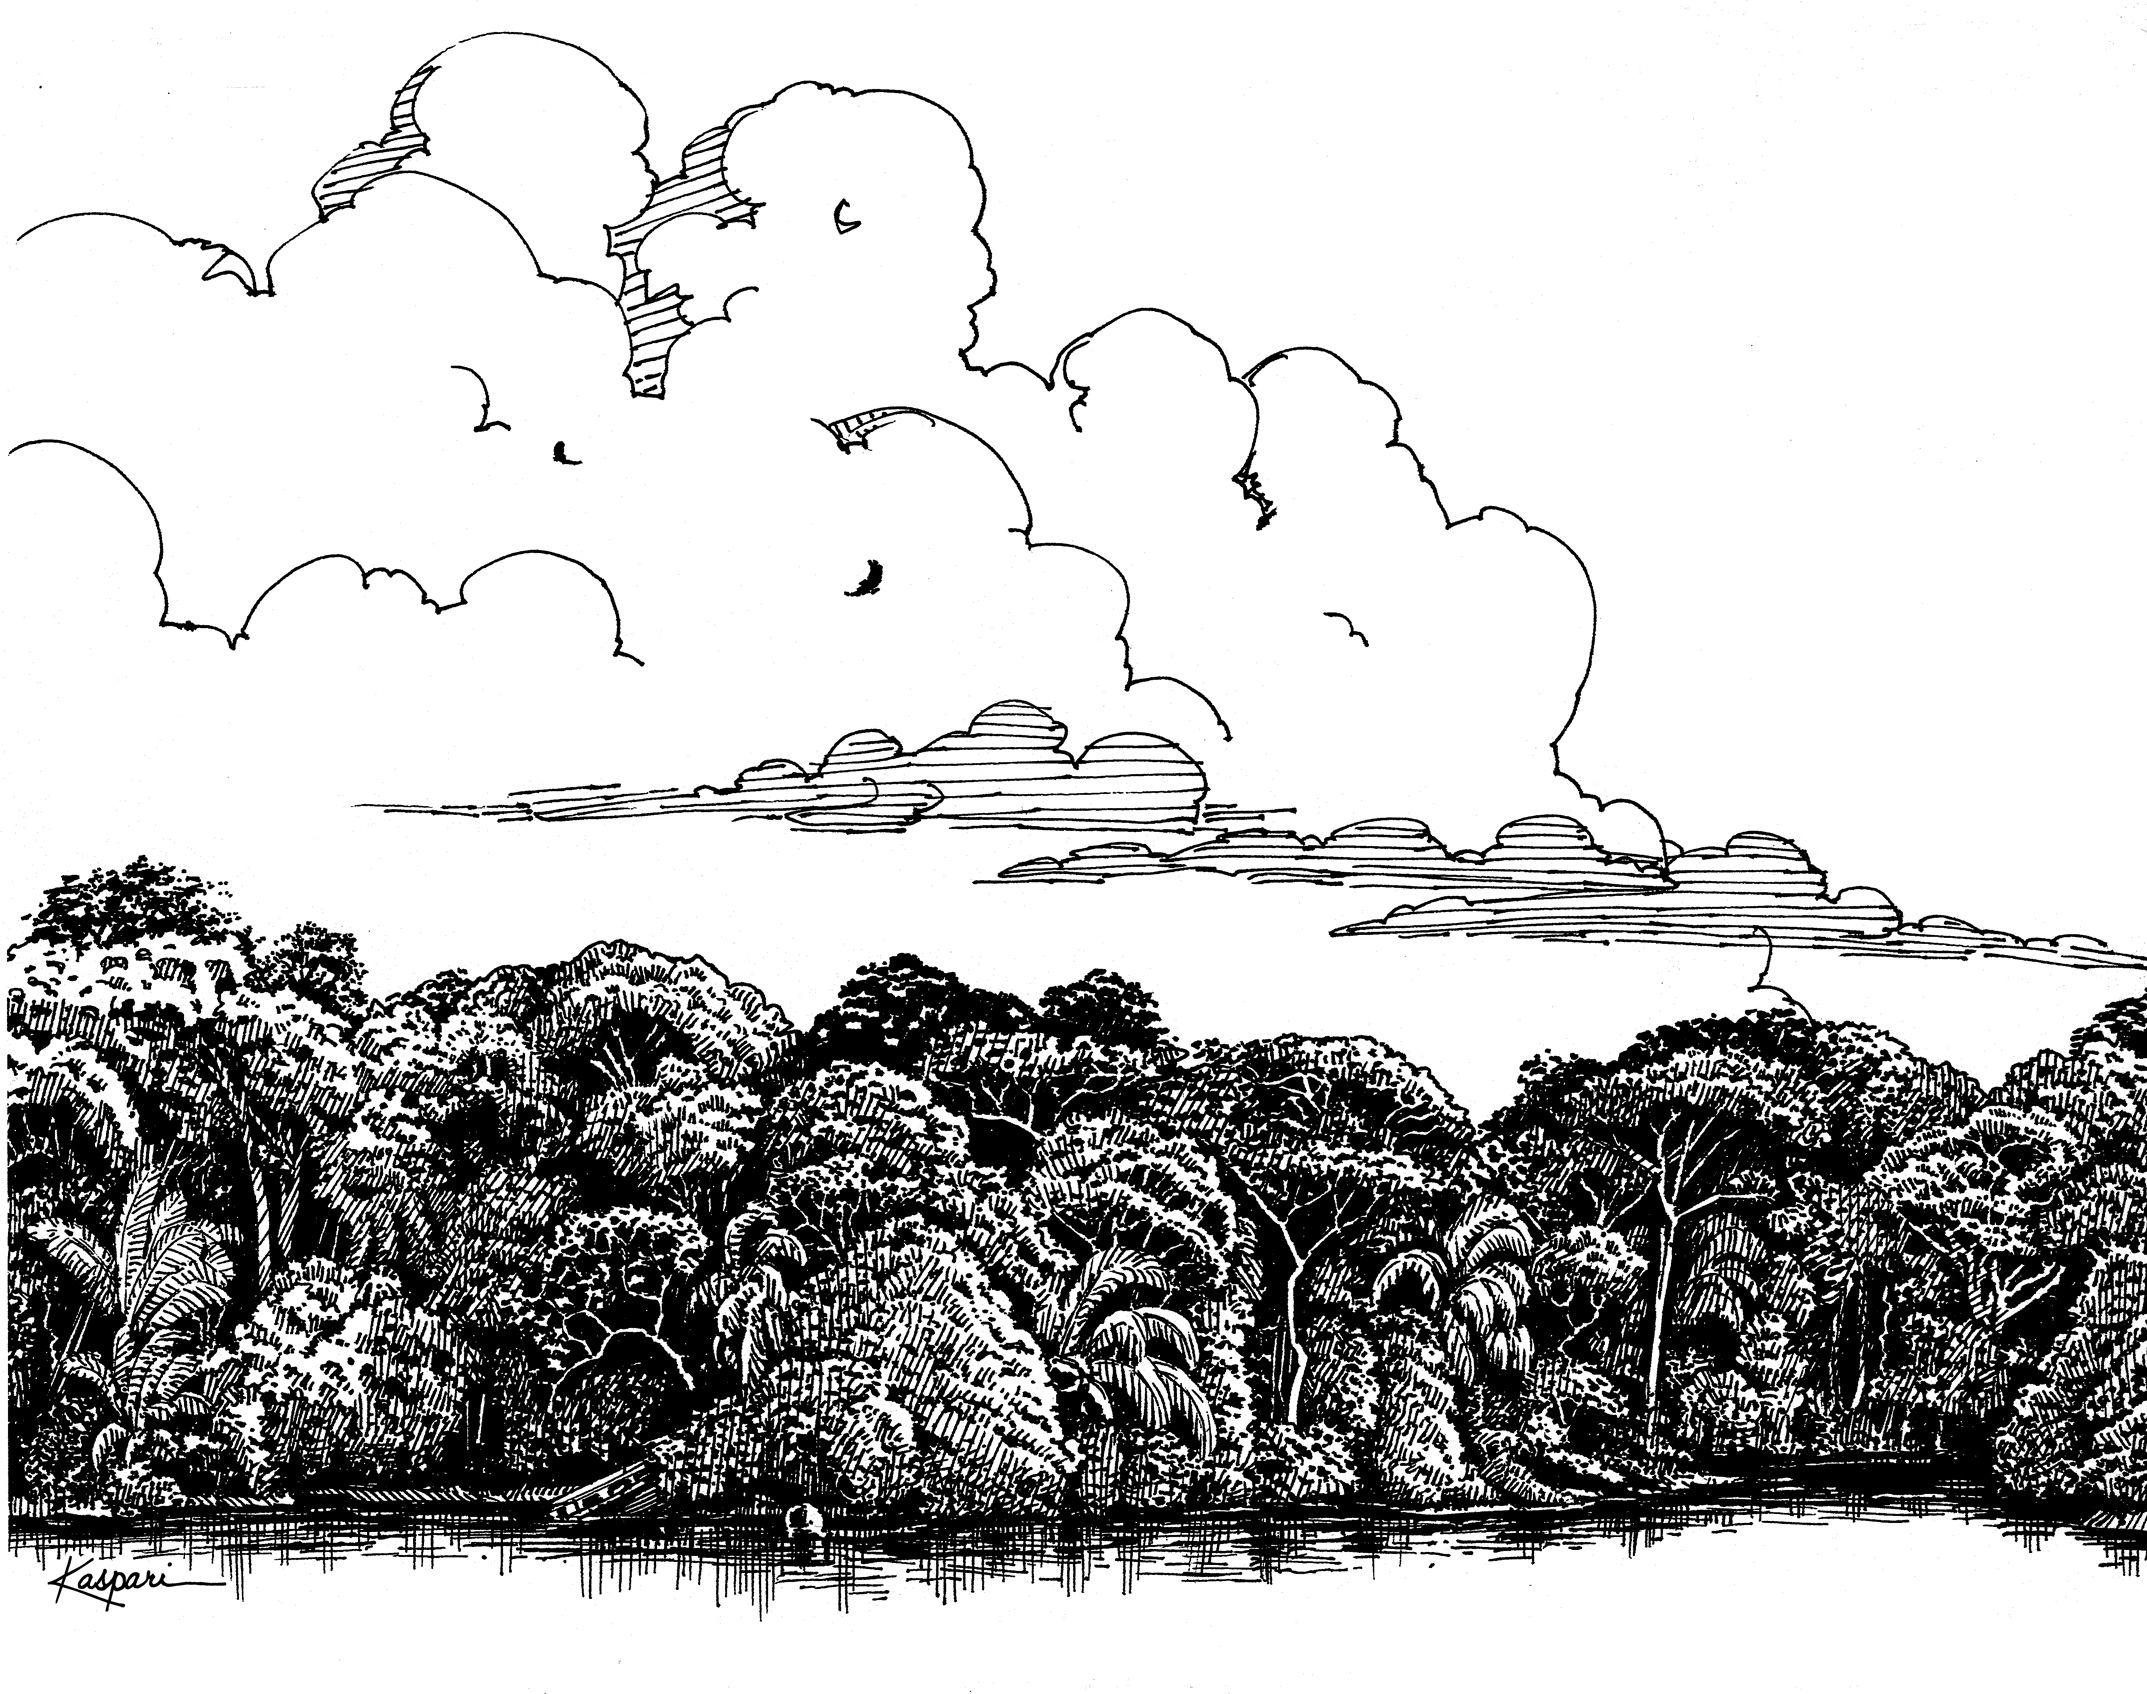 Plein Air Pen And Ink Drawings